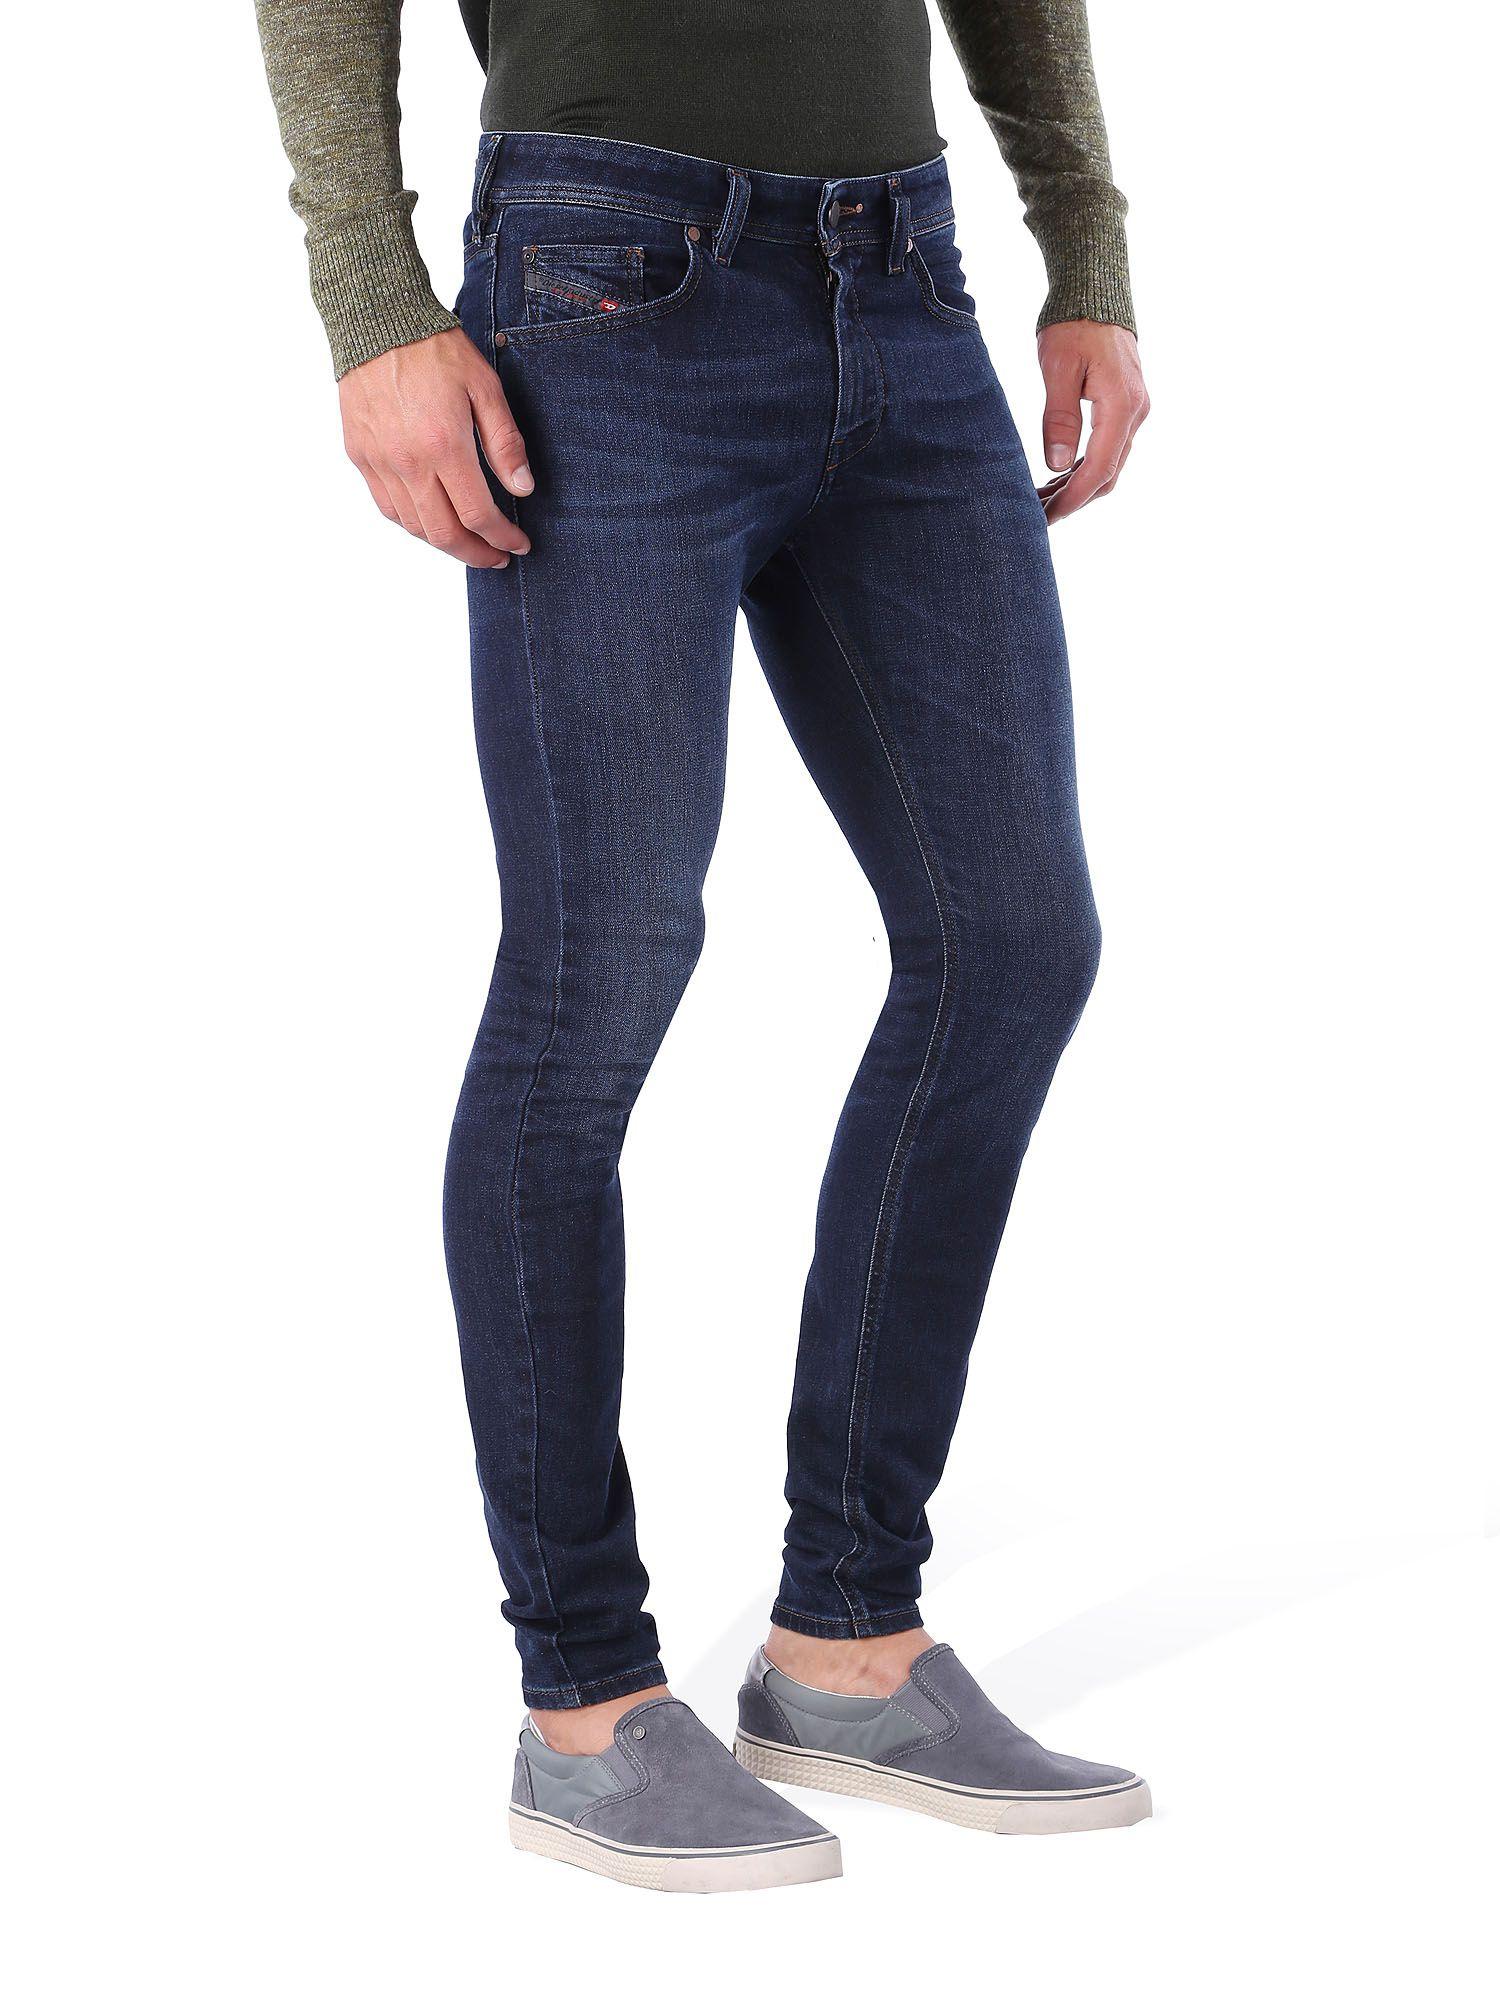 skinny jeans for men diesel stickker super skinny jeans YYACAWV